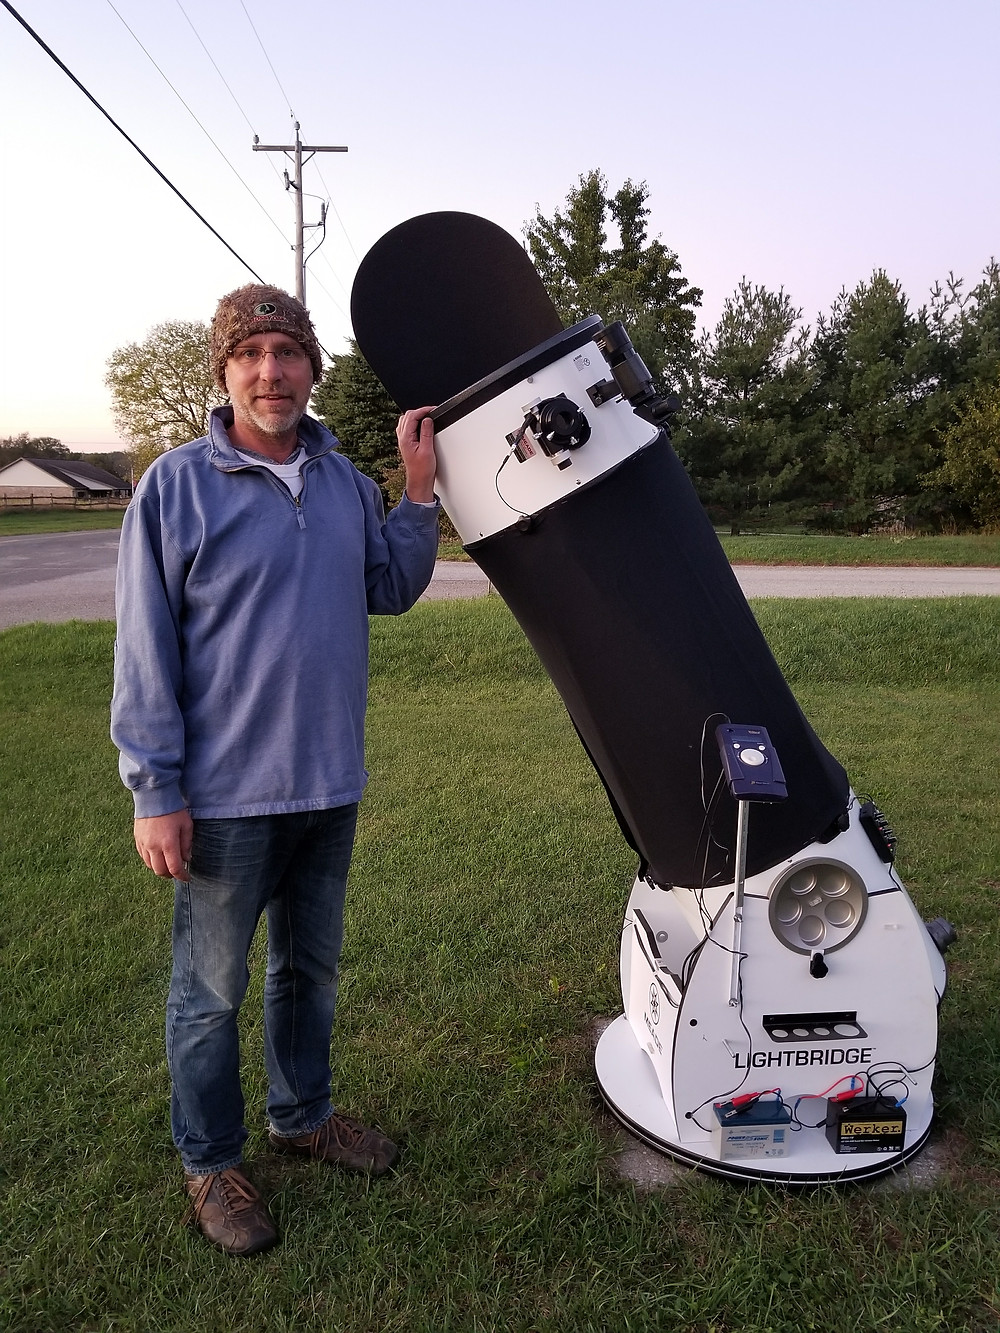 Matt Bielski and telescope; imaged provided.